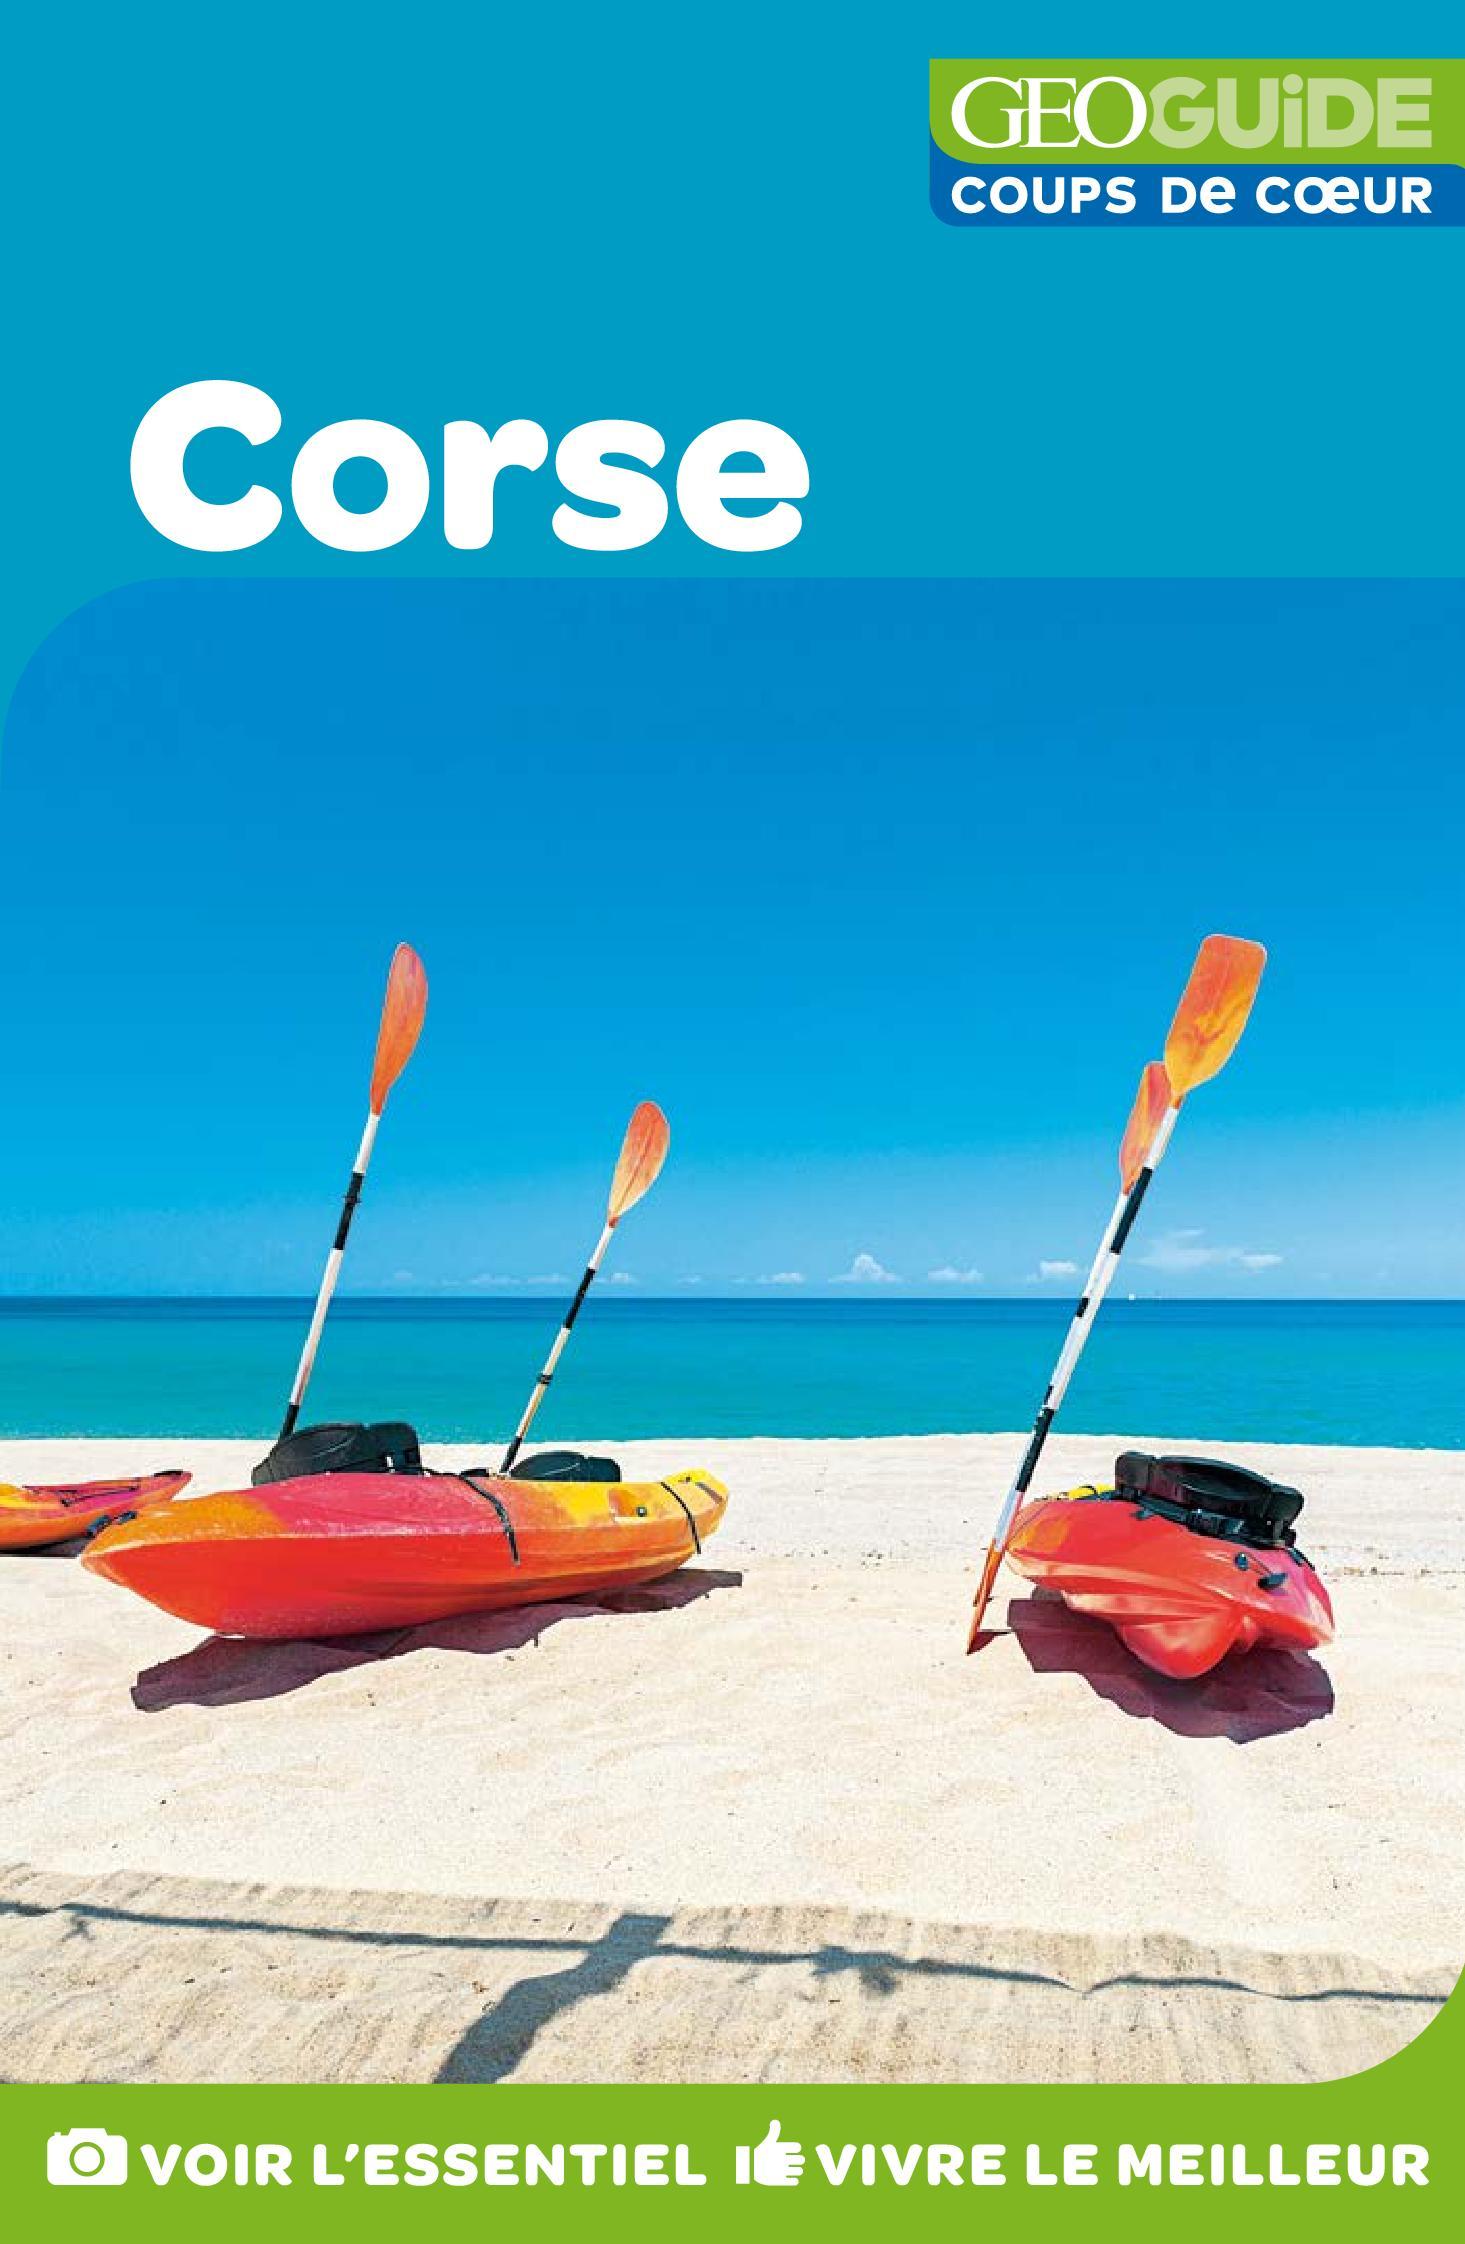 GEOguide Coups de coeur Corse | Collectif Gallimard Loisirs,